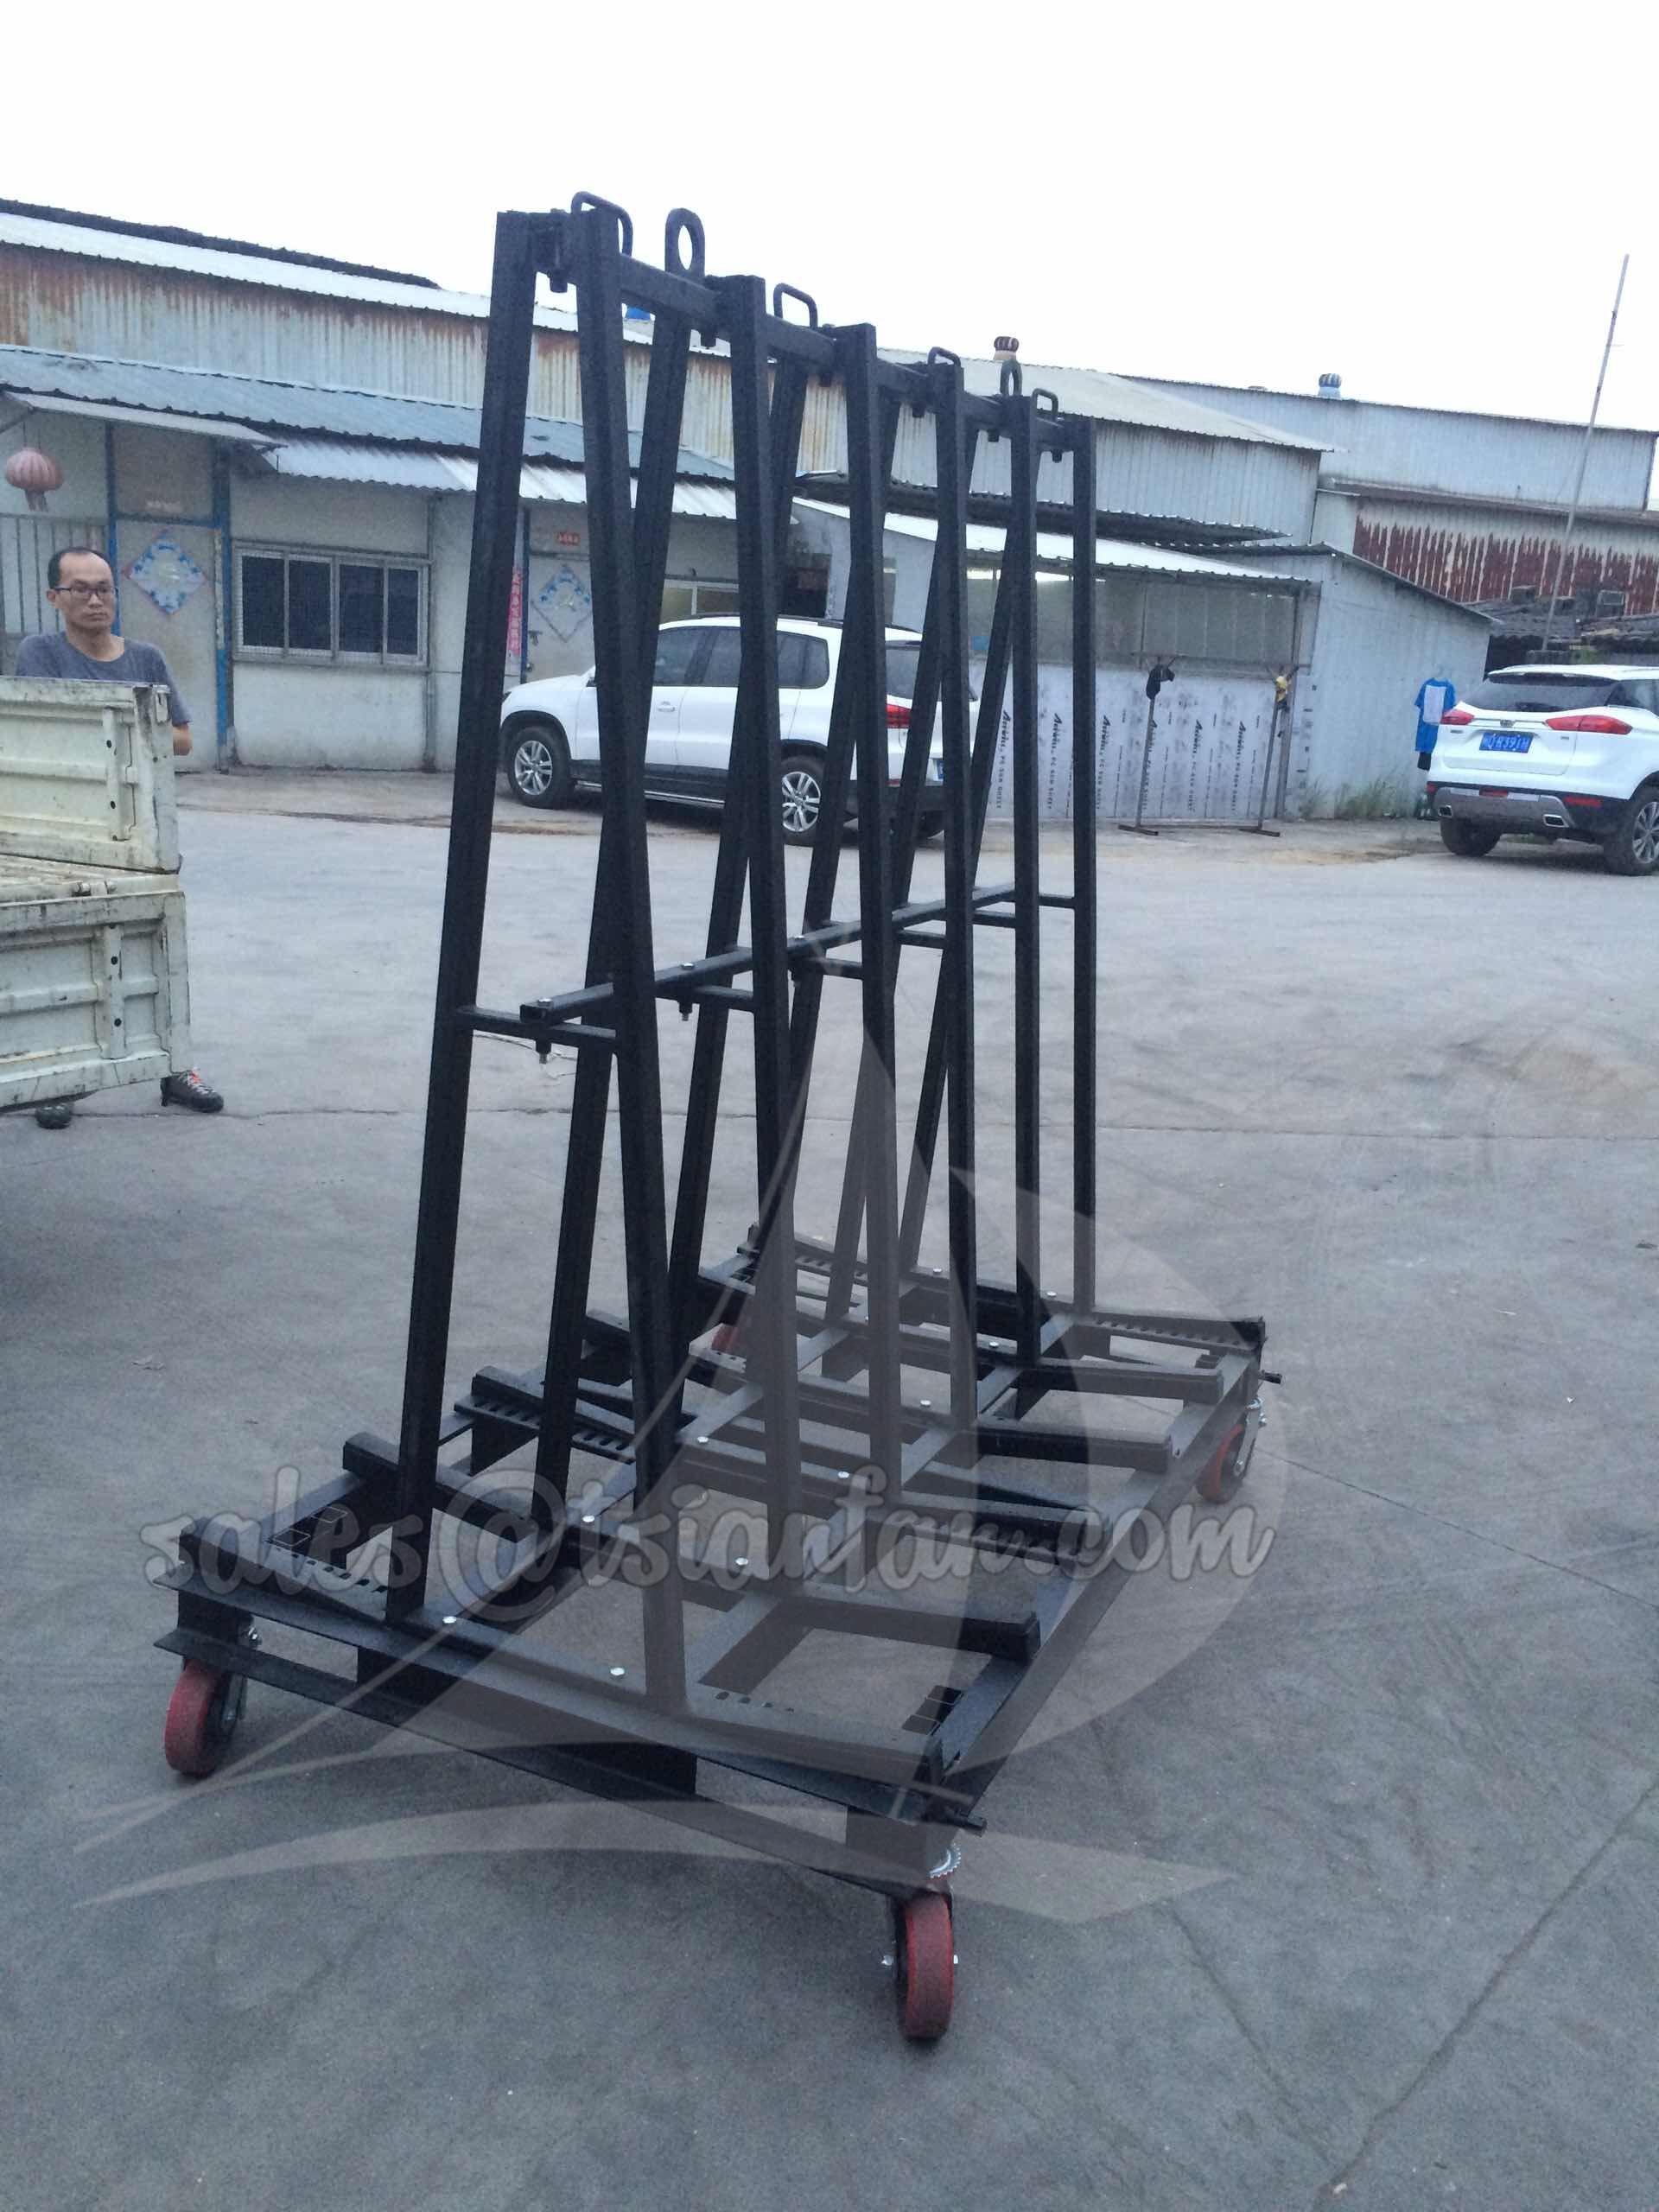 Glass Transport Rack - Stone Slab Transport Rack Designed for